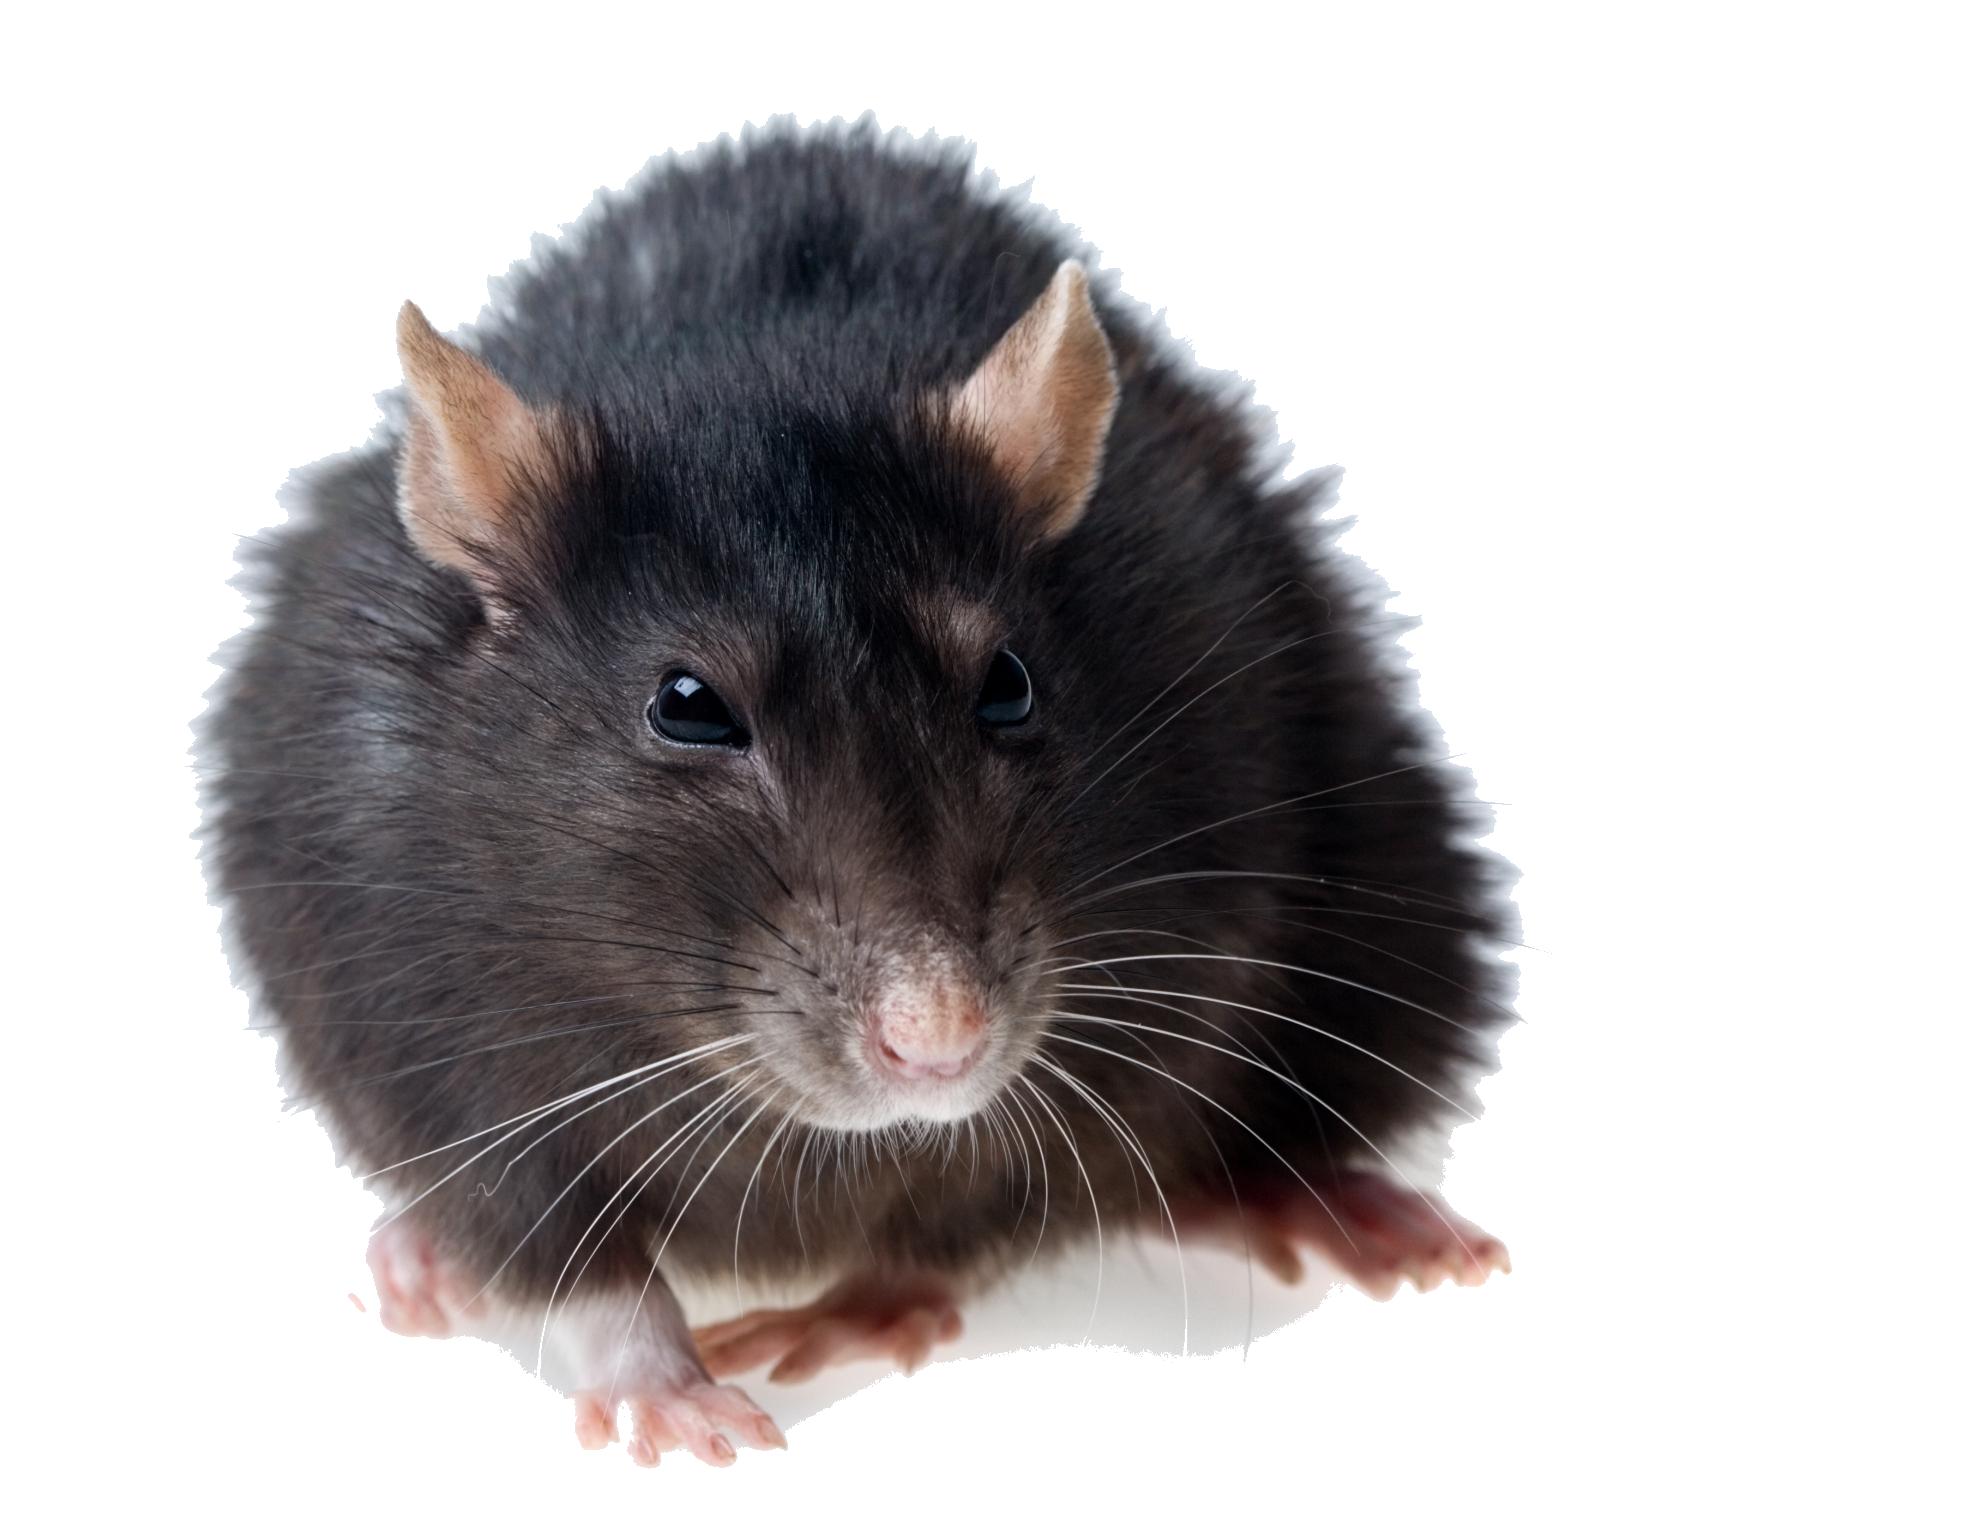 Rat PNG Images Transparent Free Download.